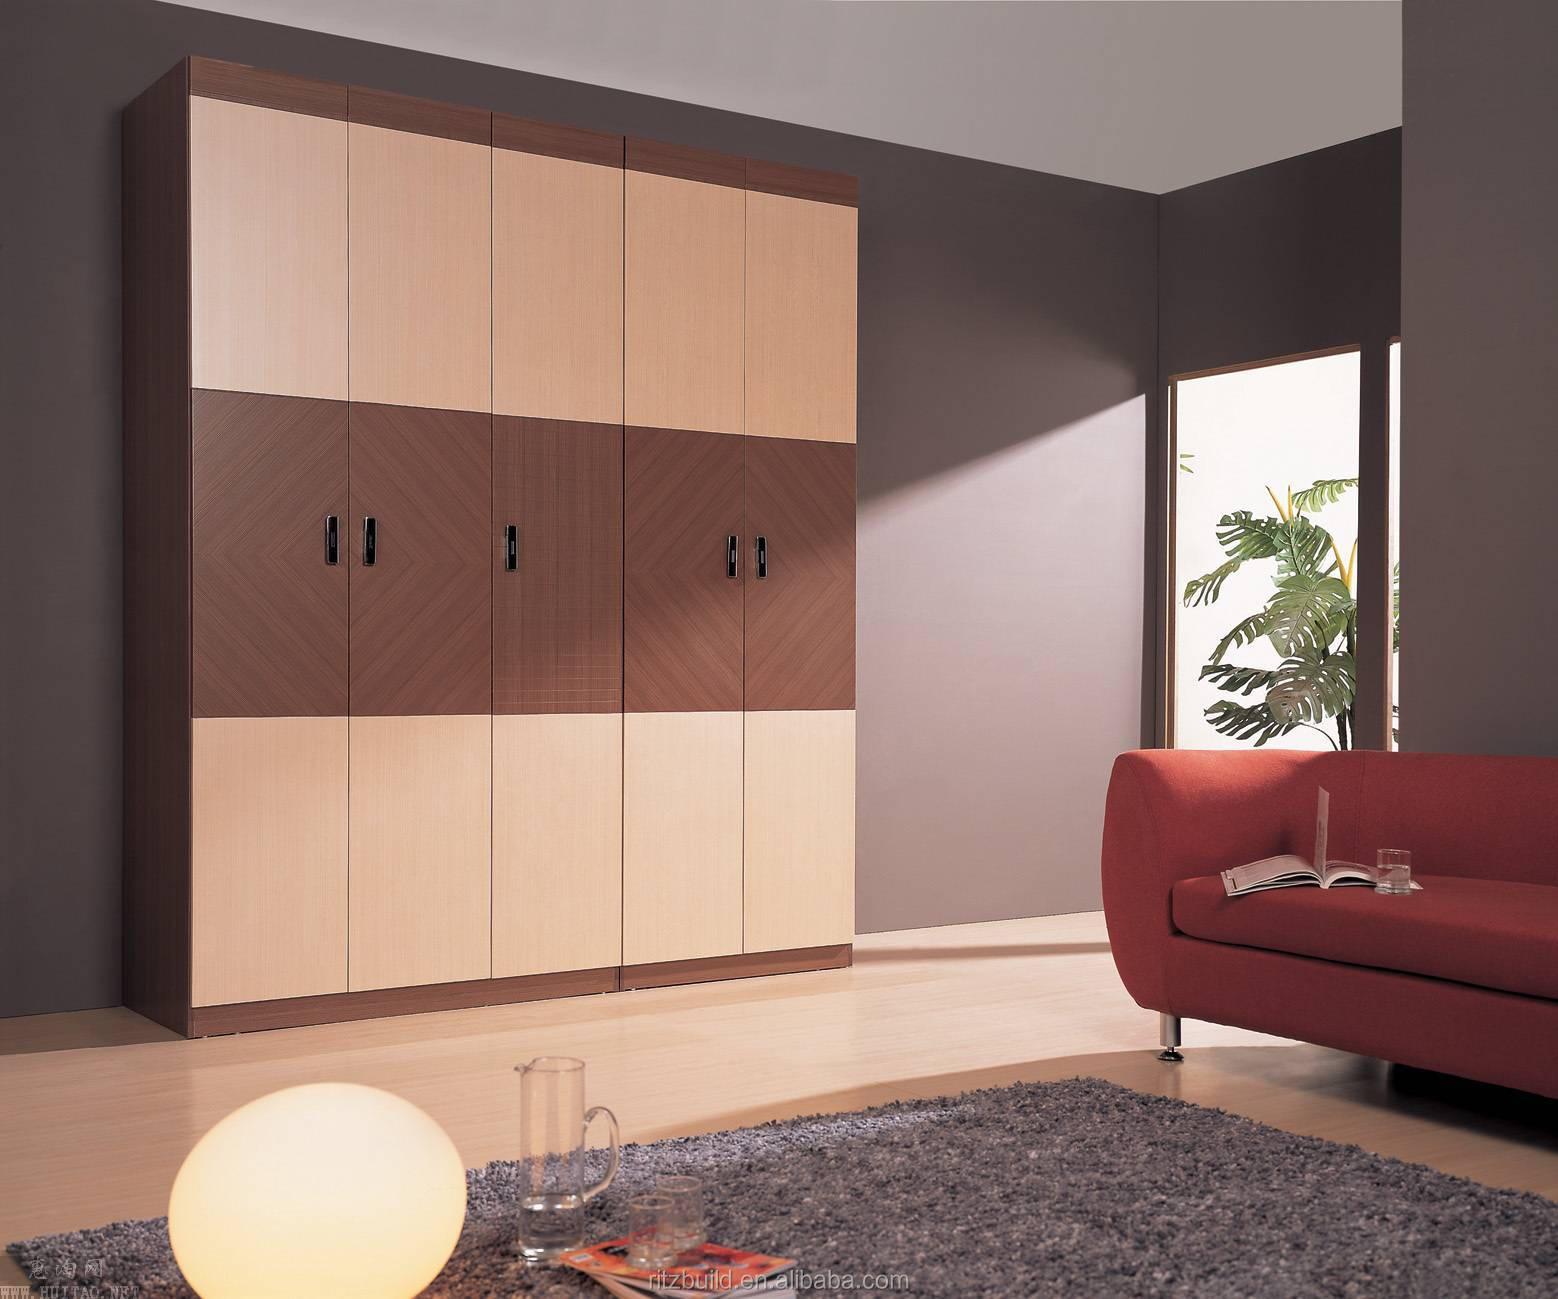 Ritz Homemade Bedroom Furniture Wardrobe Closet Wardrobe Buy Modern Bedroom Wardrobe Closet